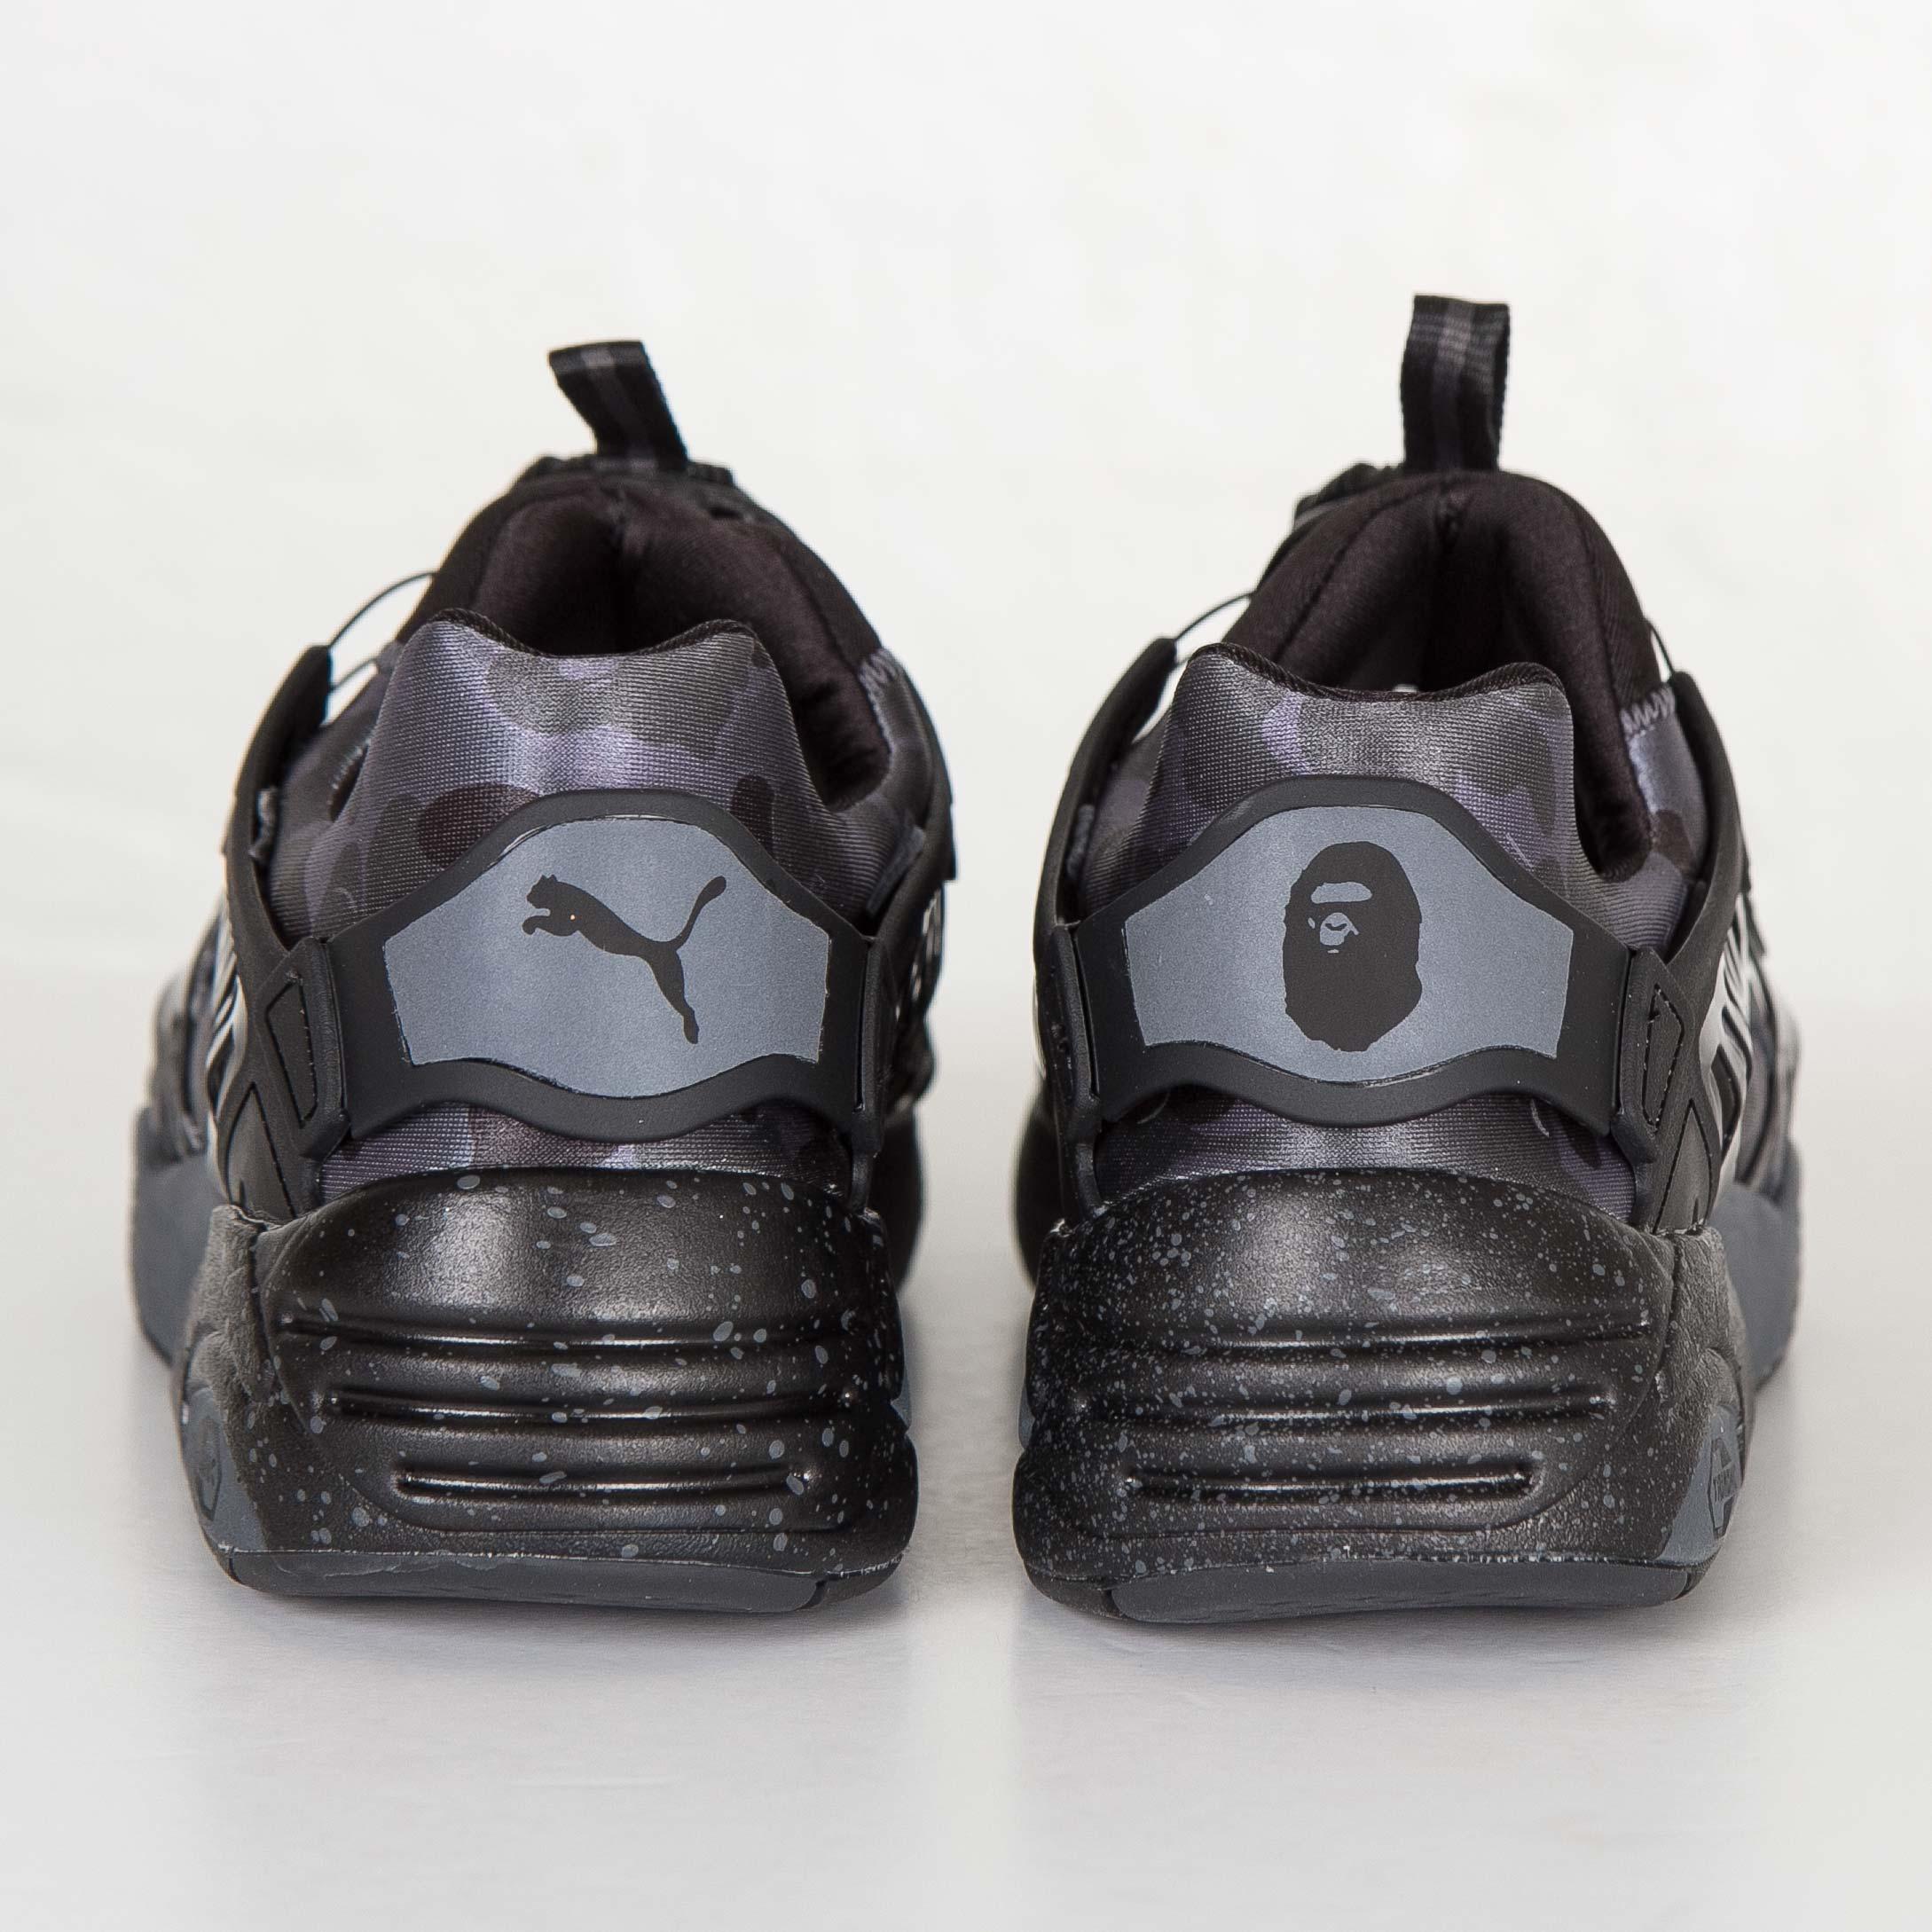 02 358846 Blaze X Bape SneakersnstuffSneakers Puma Disc 3uTK15JFlc